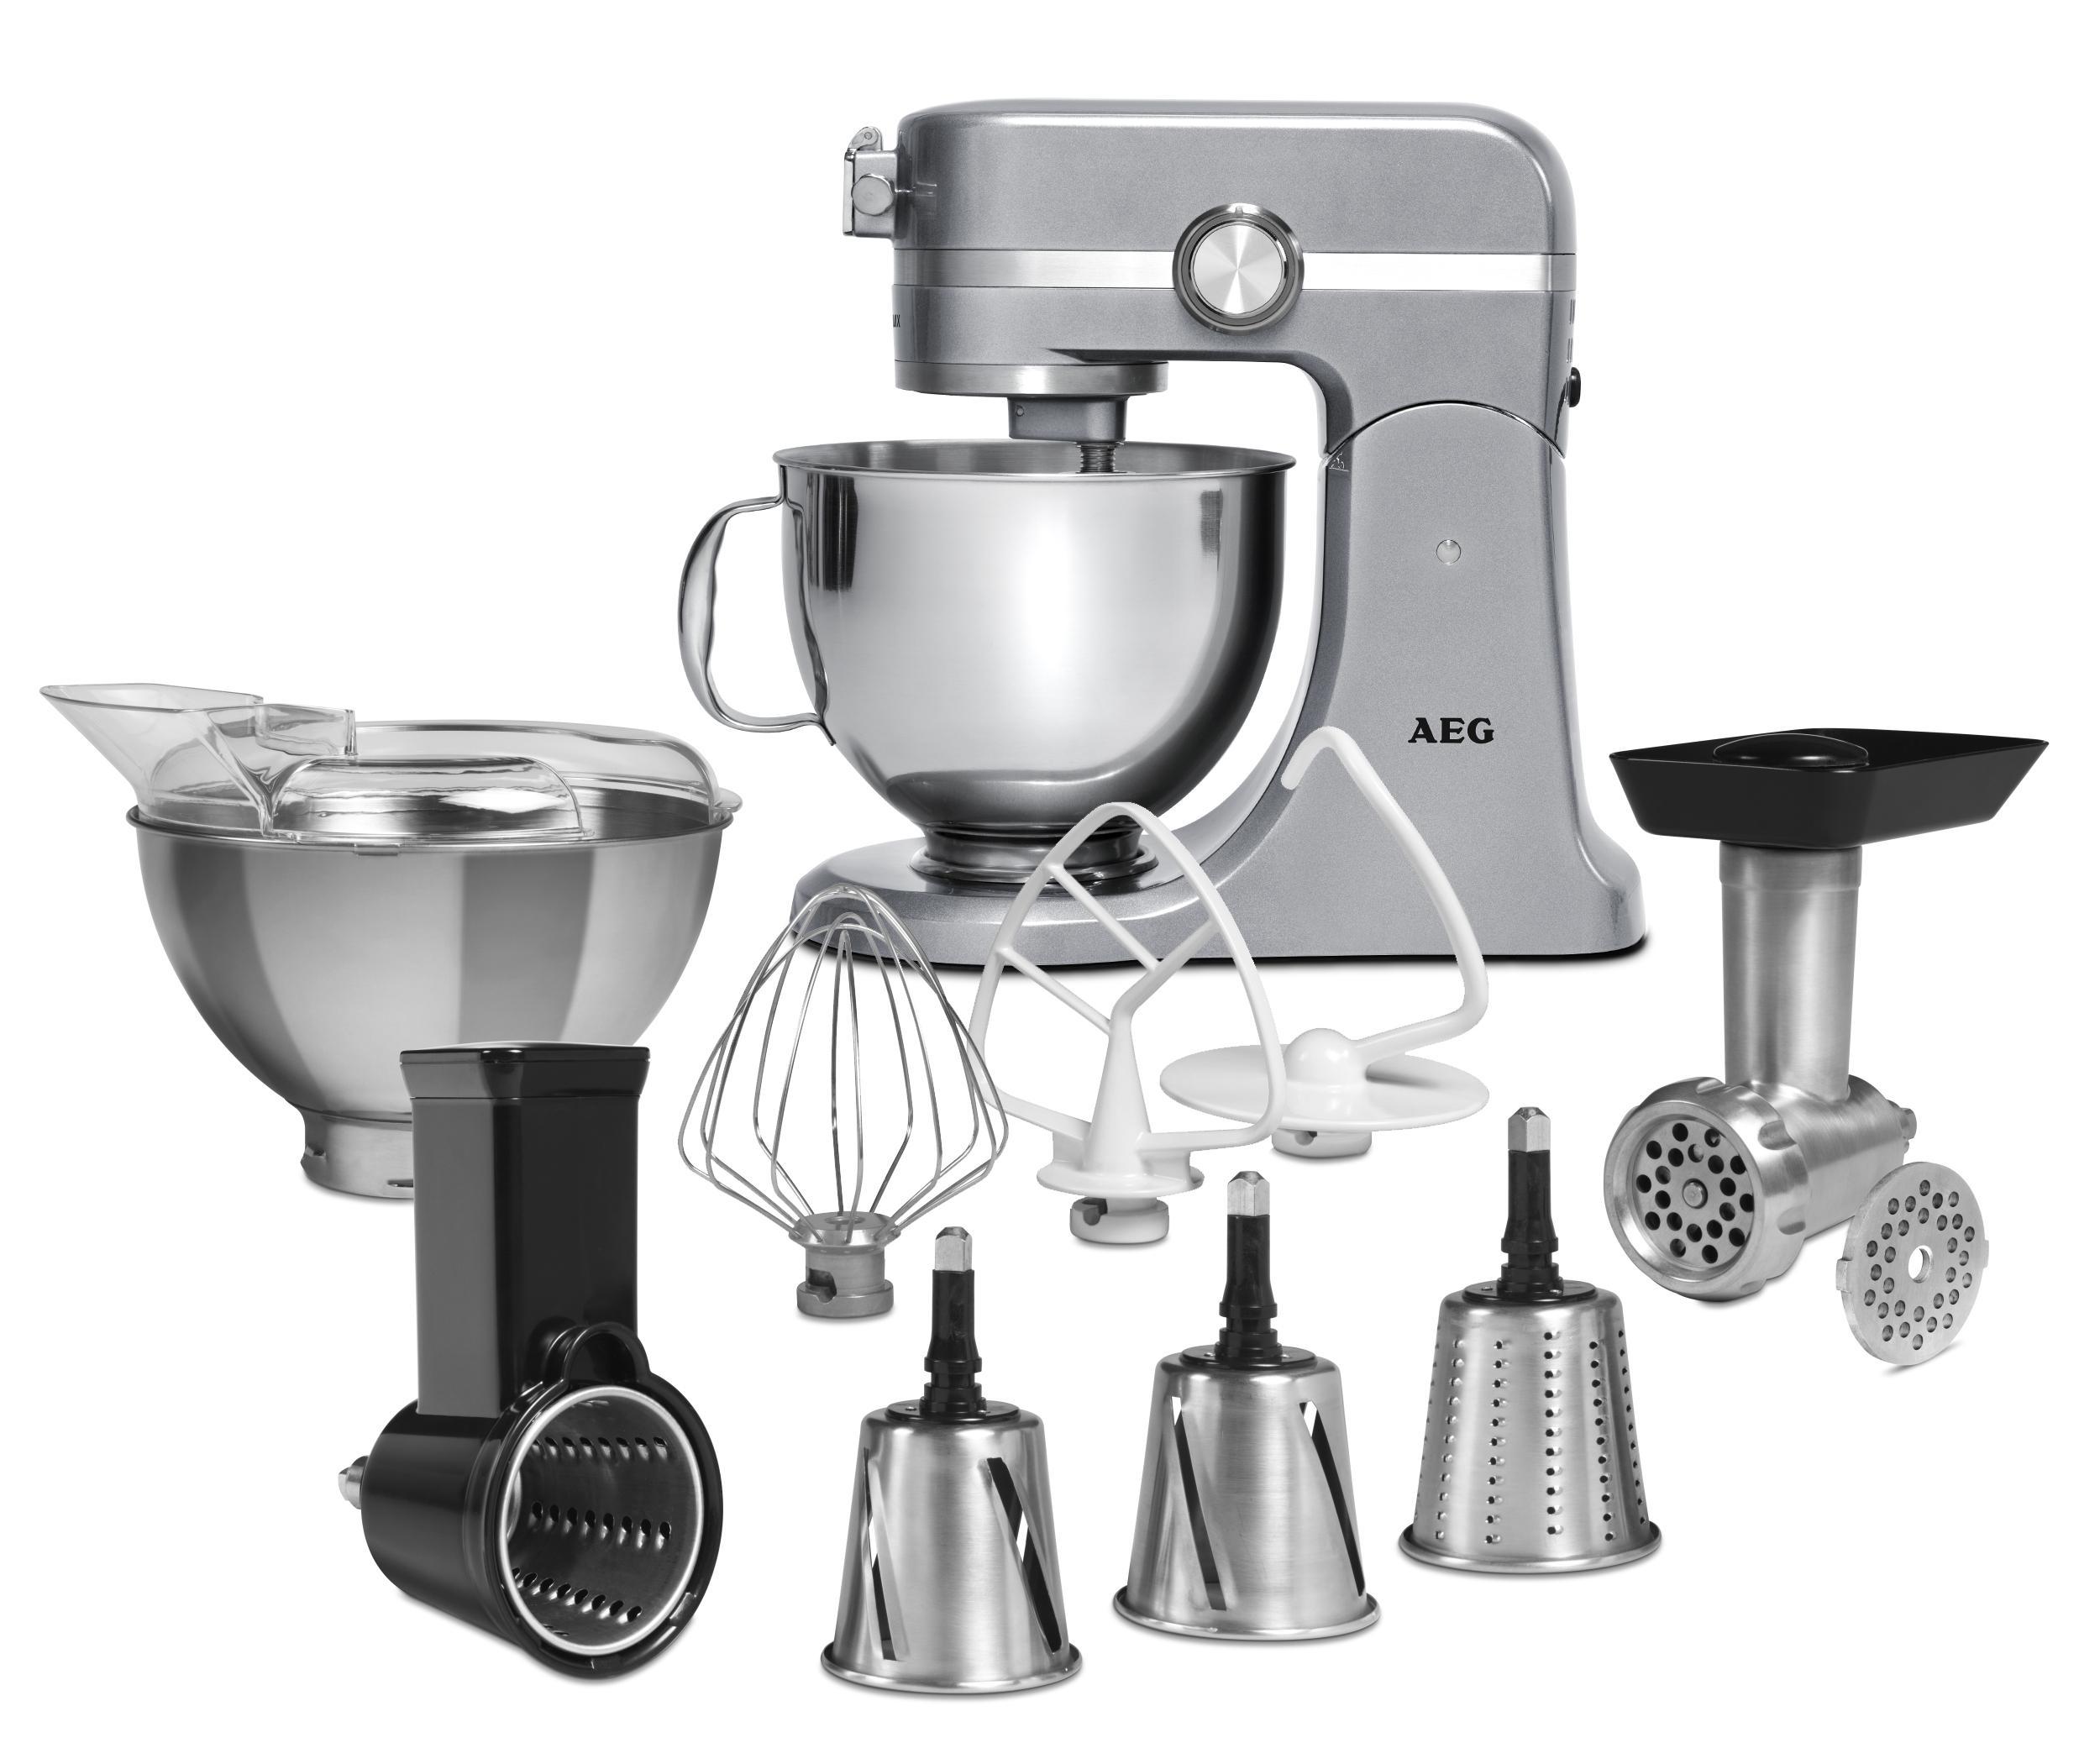 Kitchen Accessories Amazon Uk: AEG KM4700 Ultra Mix Kitchen Machine With Accessories